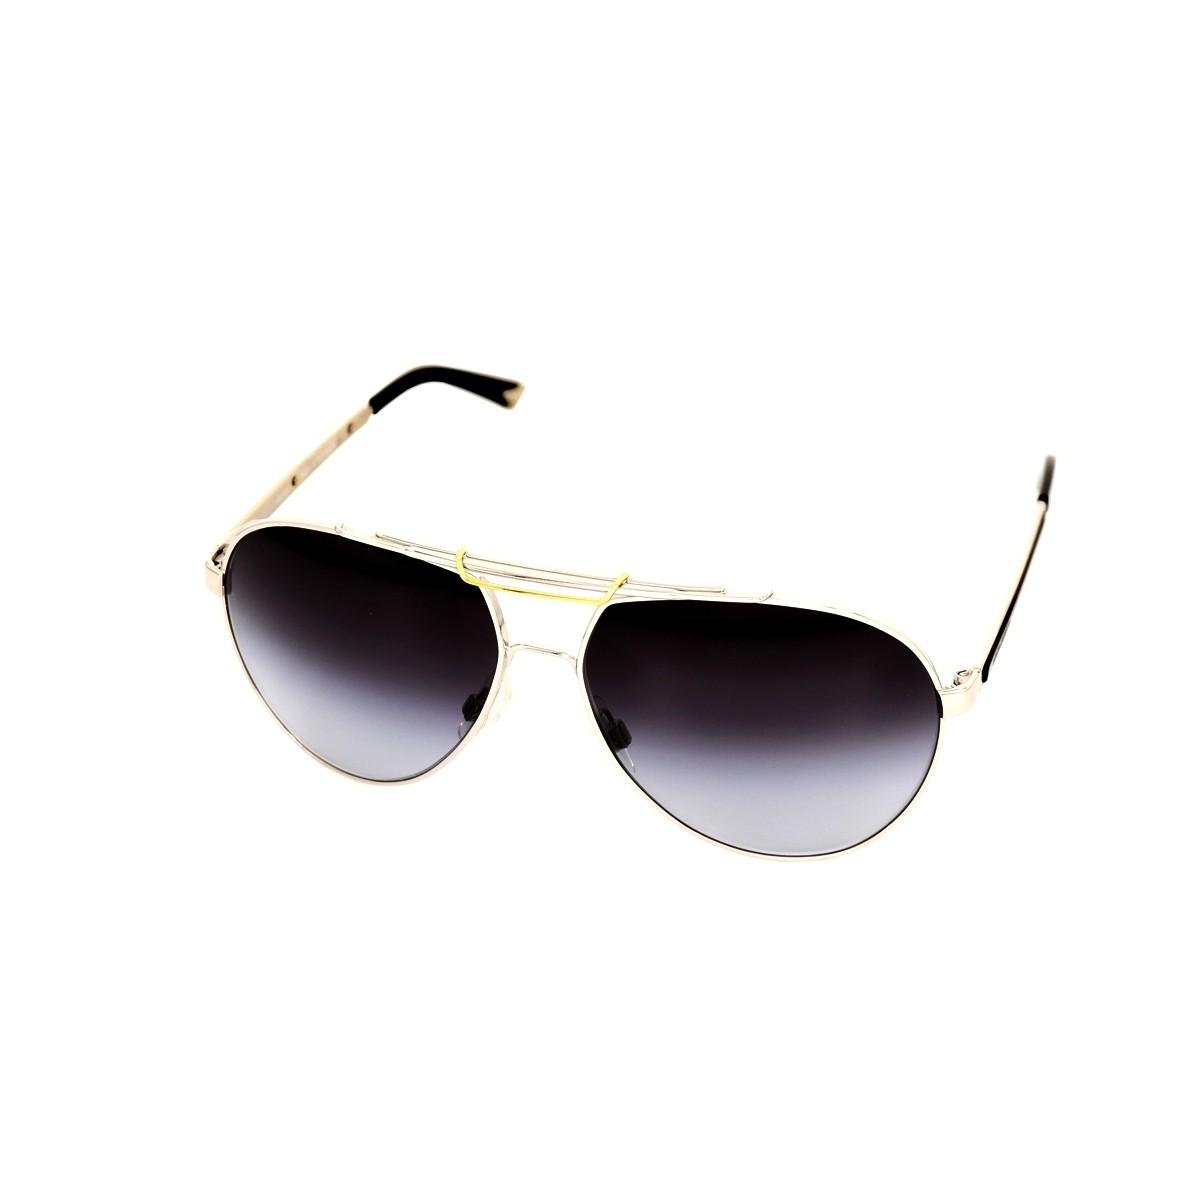 Dolce&Gabbana 2105 argento 05/8G, 148,00€, Occhiali Dolce&Gabbana Argento a forma Goccia aviator